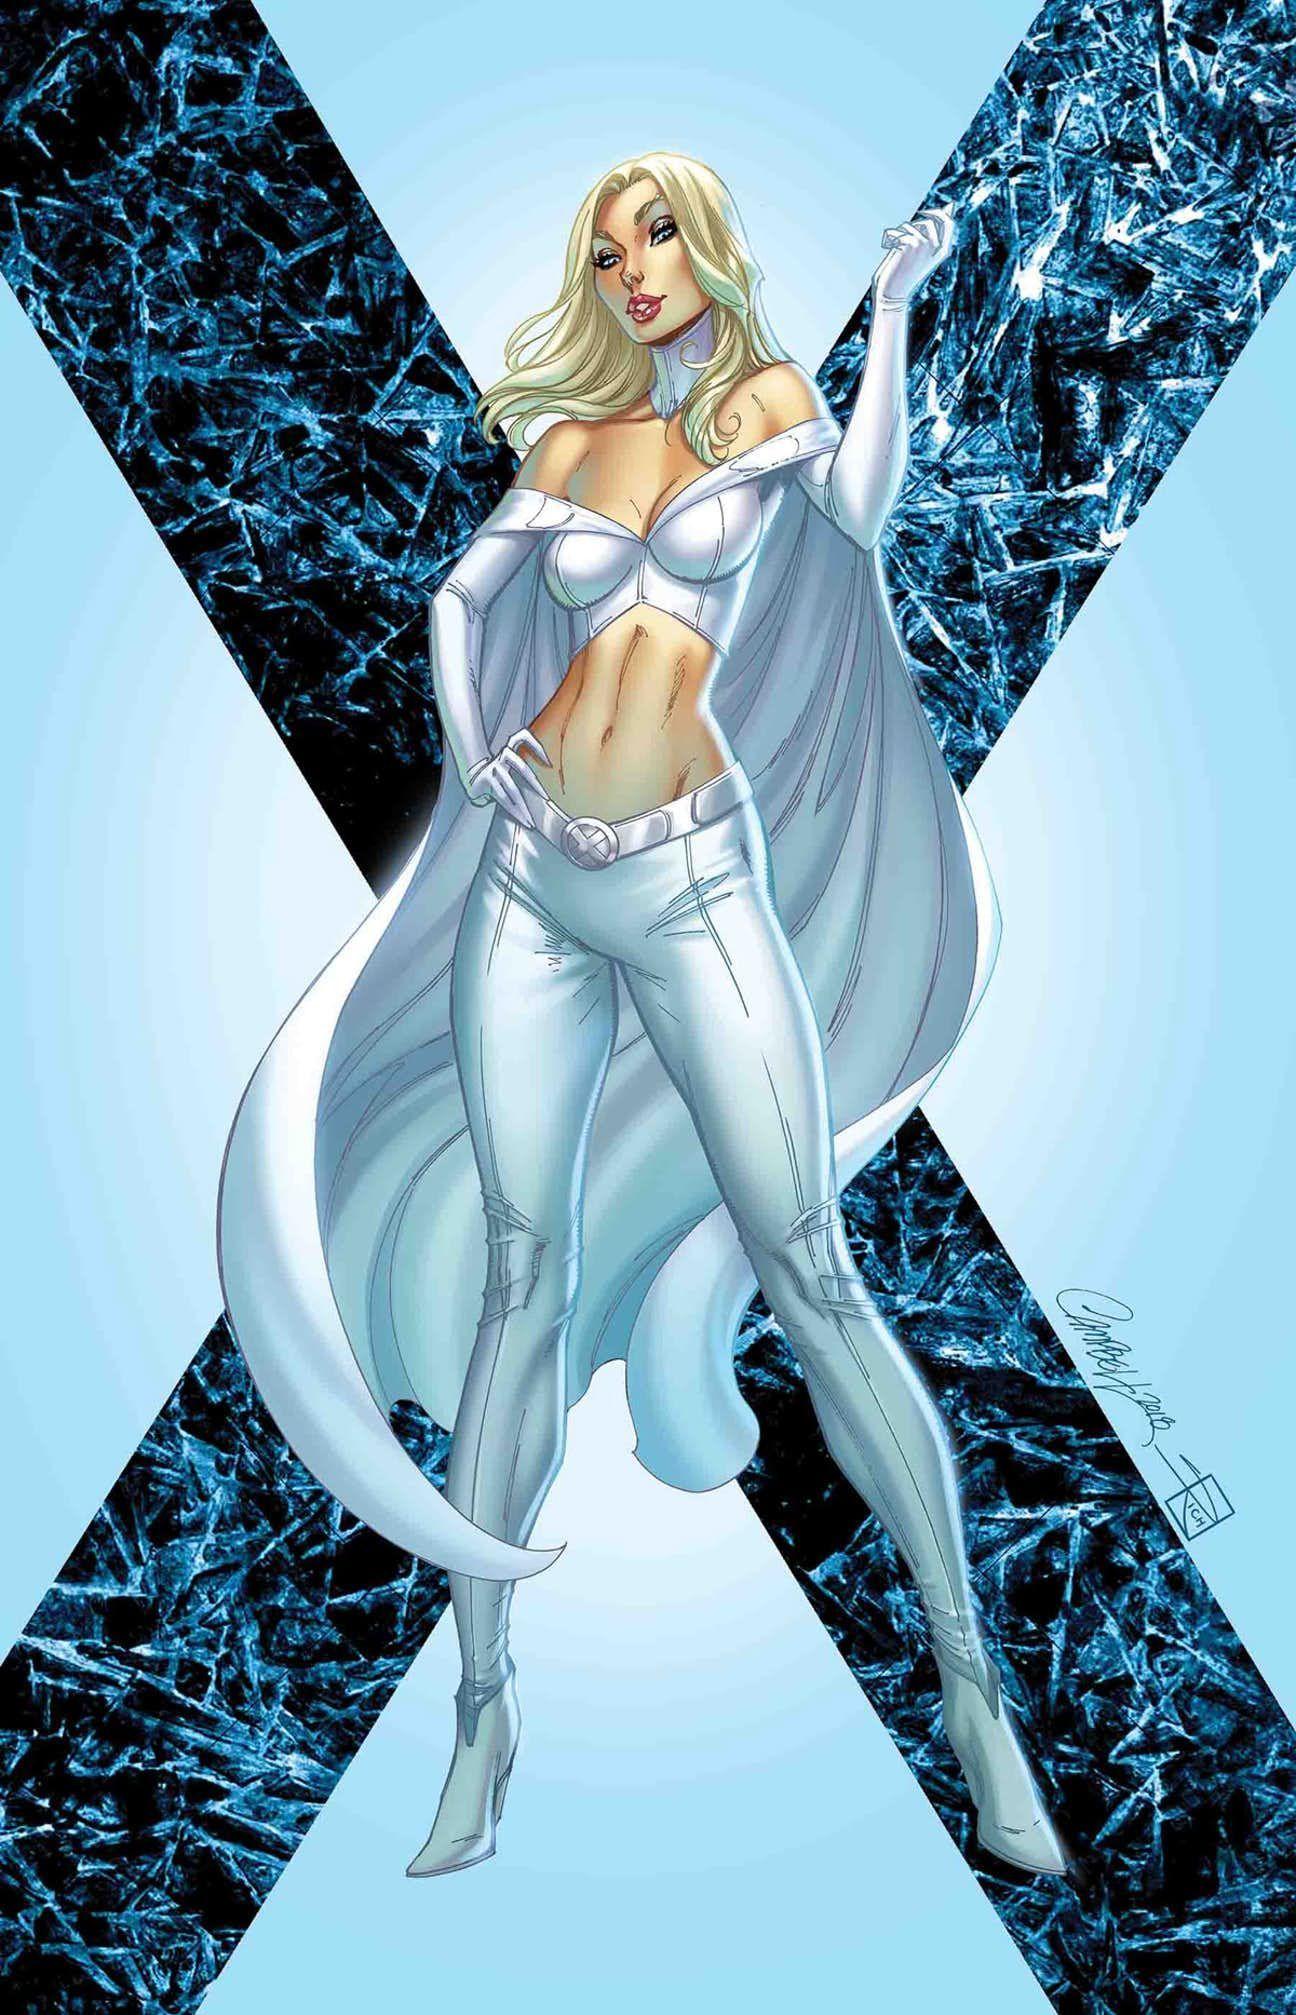 File:Emma Frost (Marvel).jpg